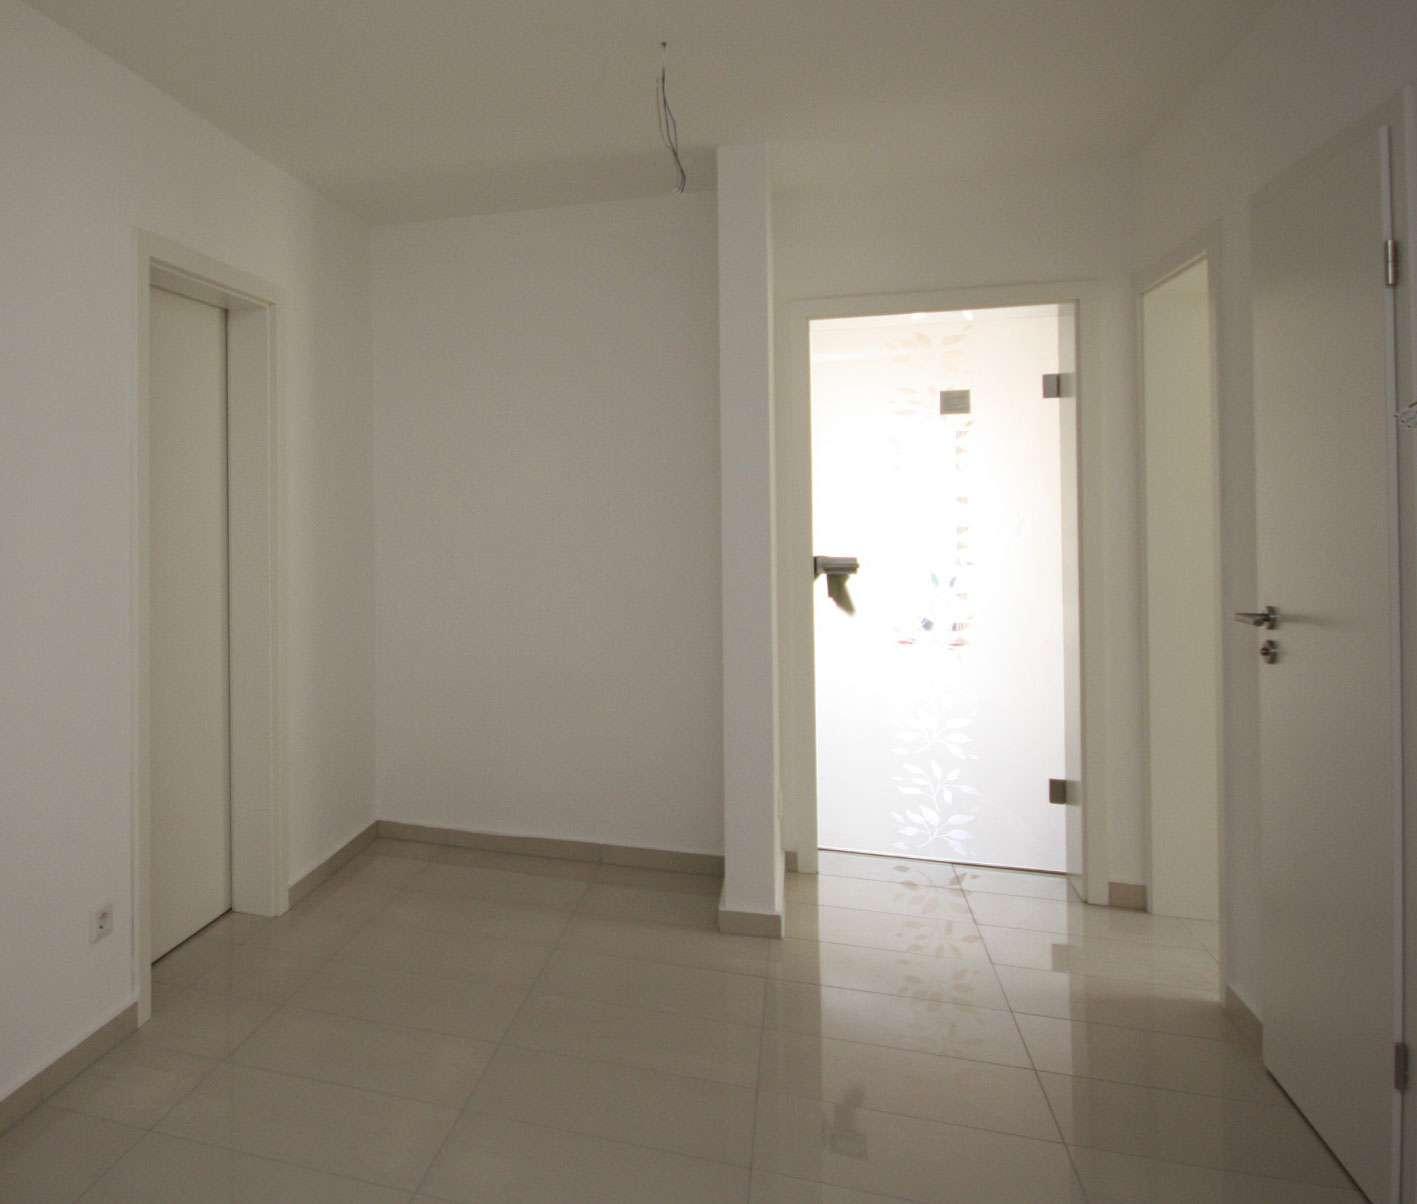 ++3 ZKB-Erstbezug/1.OG/ca. 93 m² Wfl./Balkon/TG-Stellplätze/Pfaffenhofen++